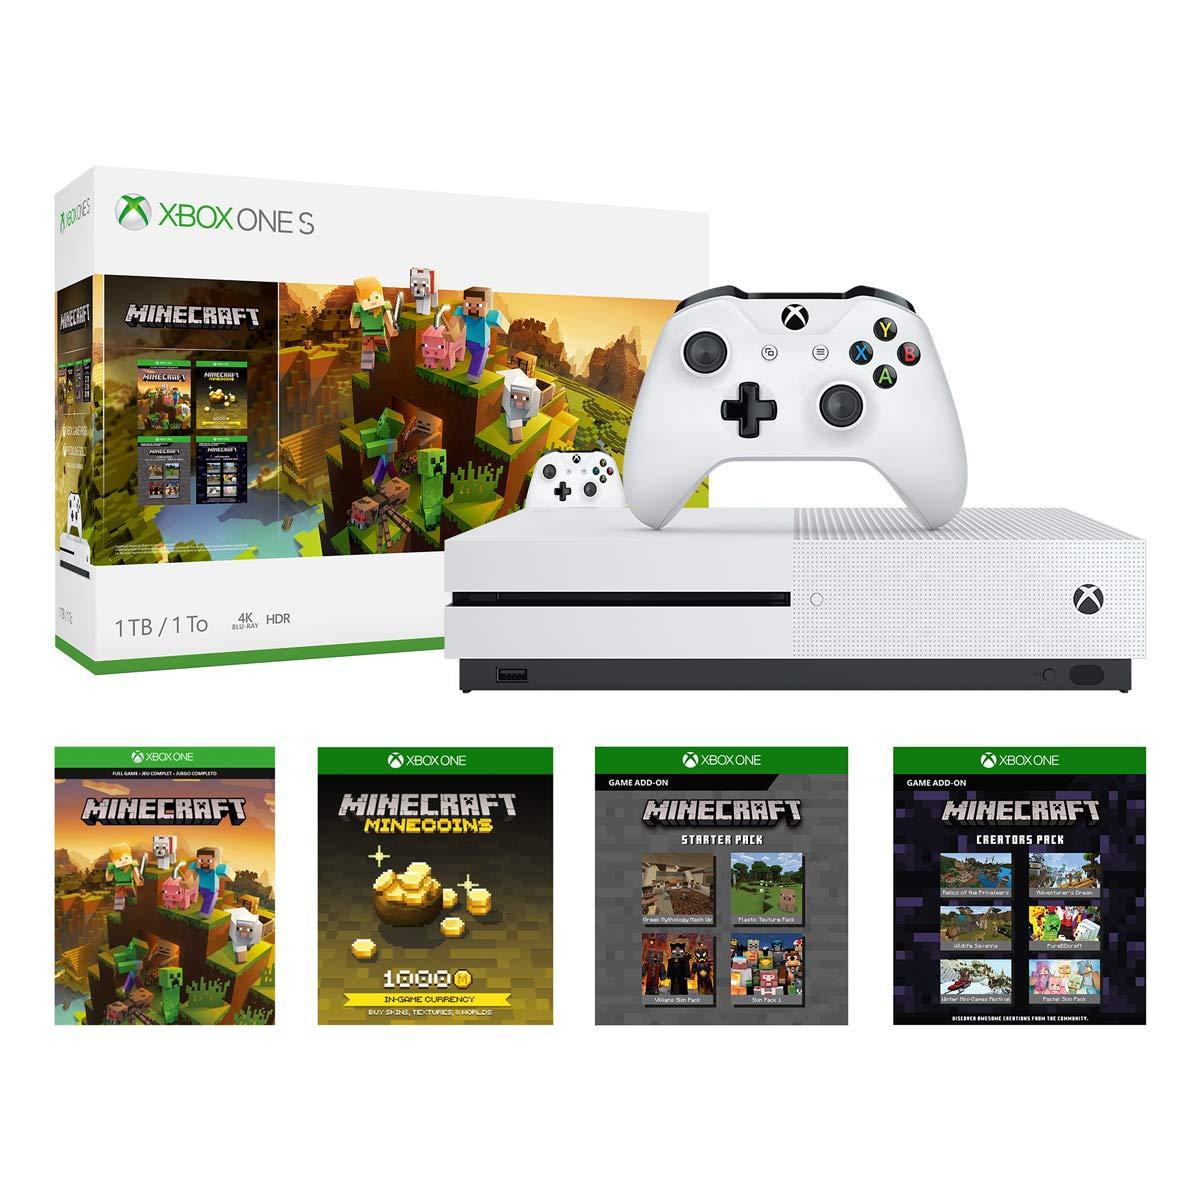 Amazon.com: Xbox One S 10Tb Console - Minecraft Creators Bundle